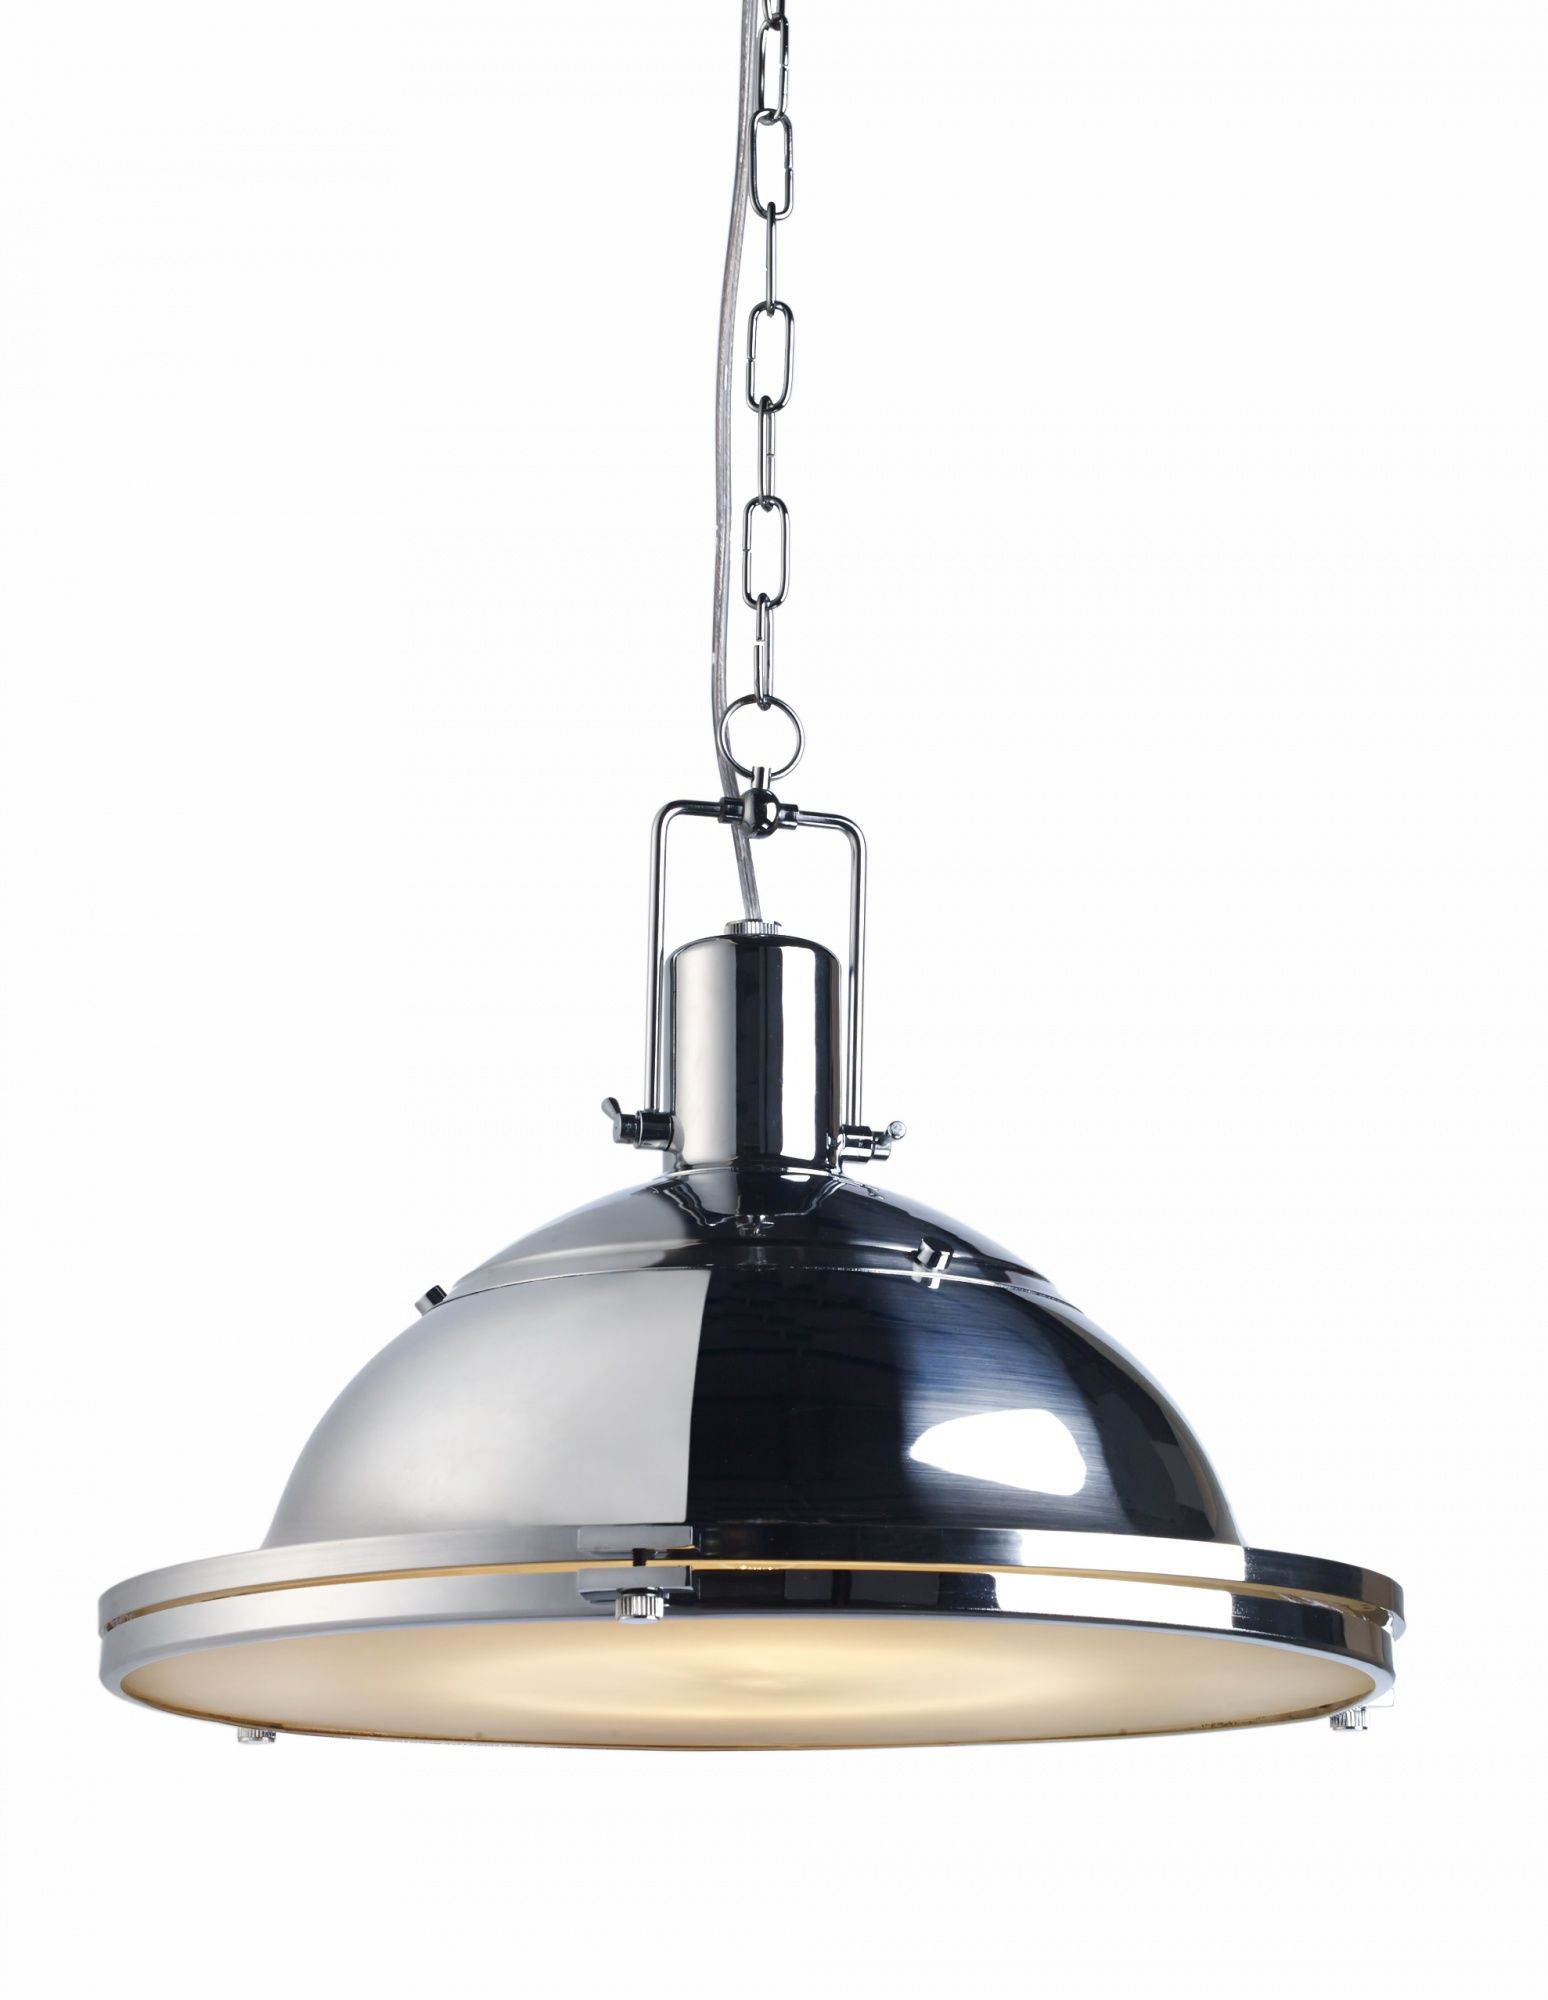 Lampa wisząca Nautilius L 10263103 oprawa chromowa Kaspa